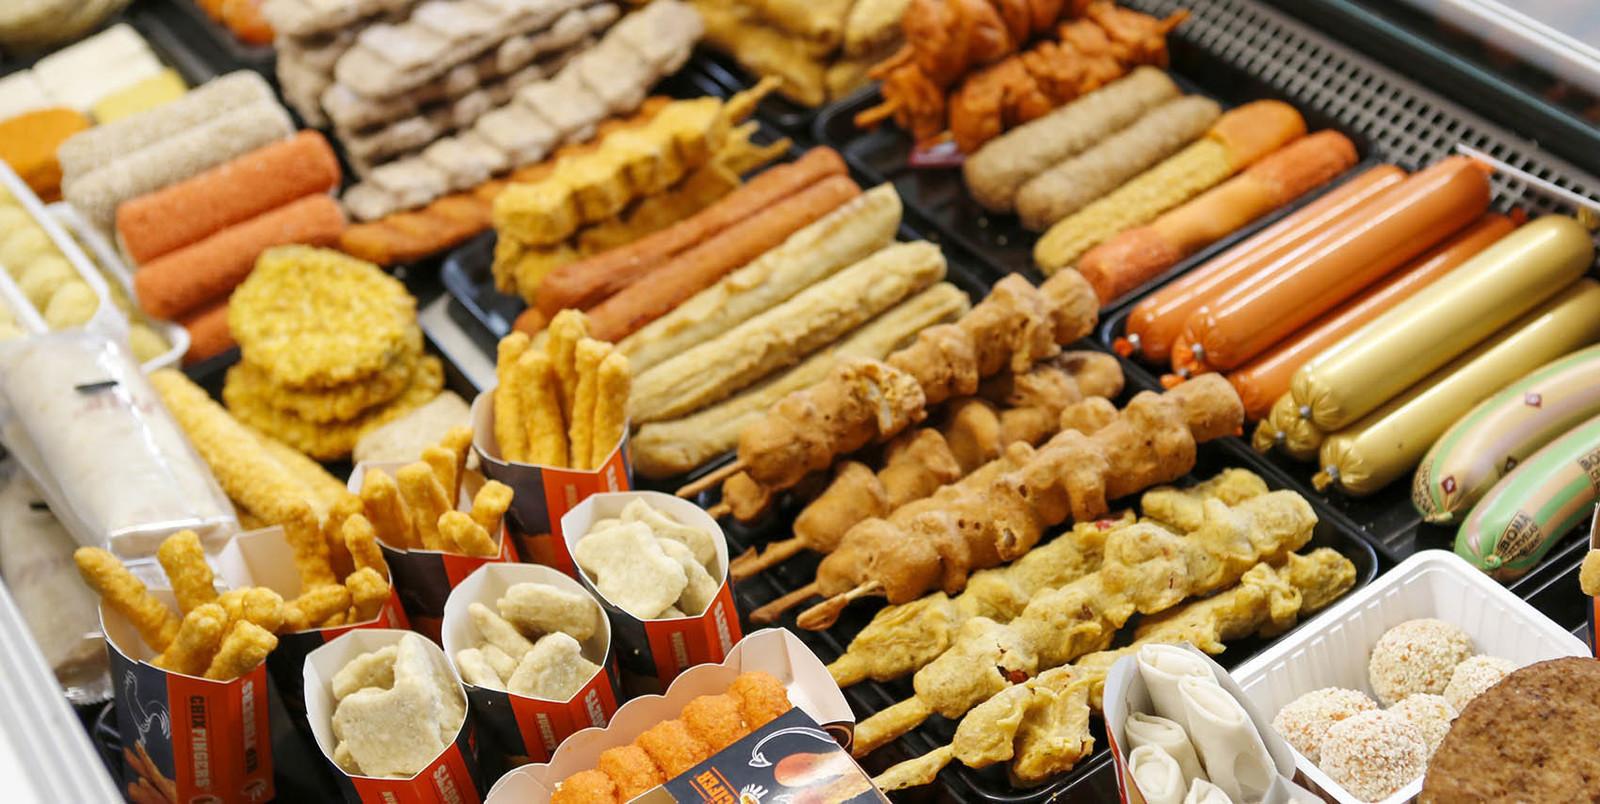 Frituur Ternat | Frituur King Frit: snacks, saus, frietjes